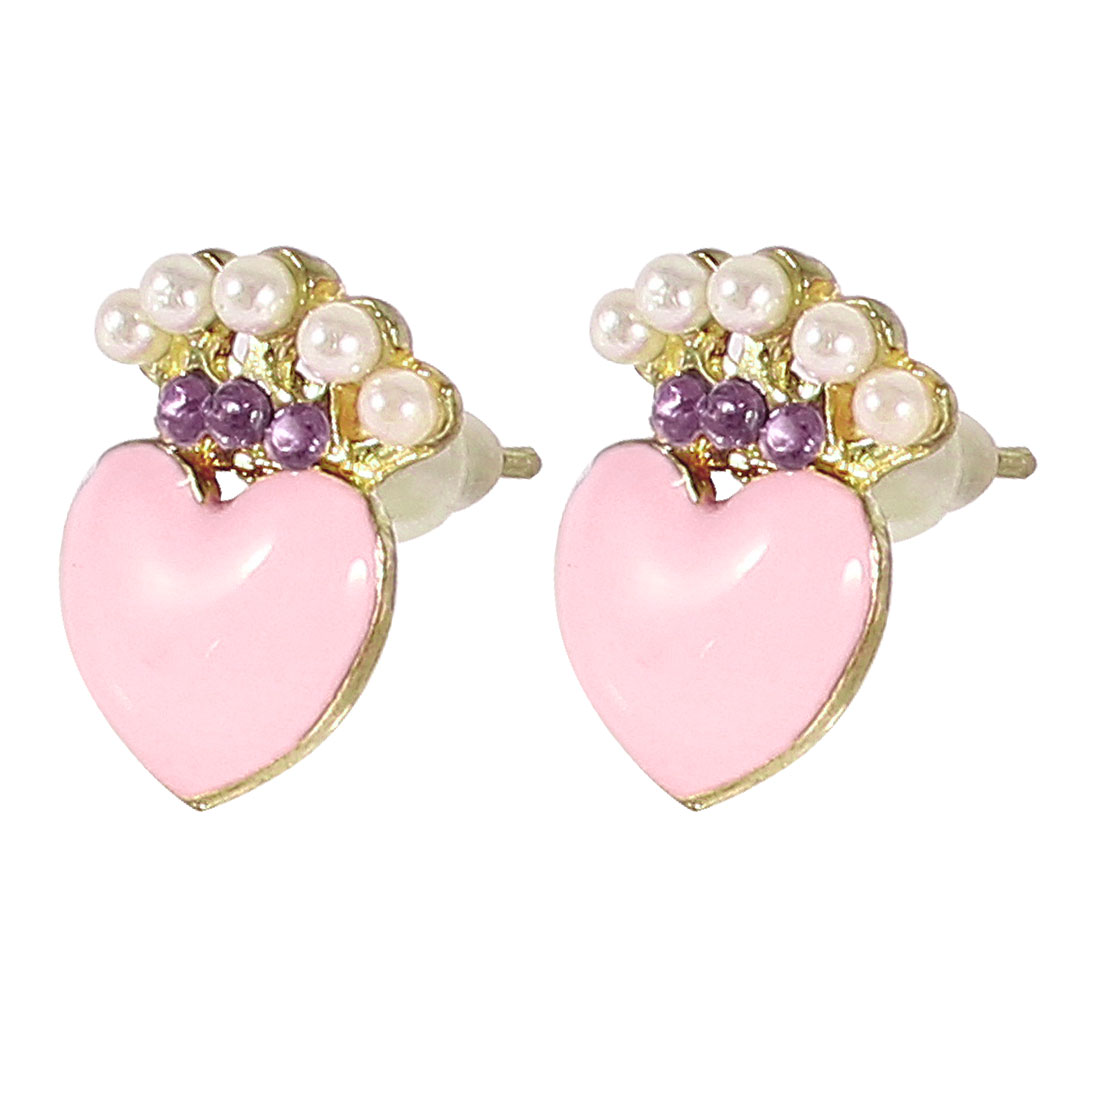 Woman Ear Ornament Pink Heart Design Stud Earrings Gold Tone Pair